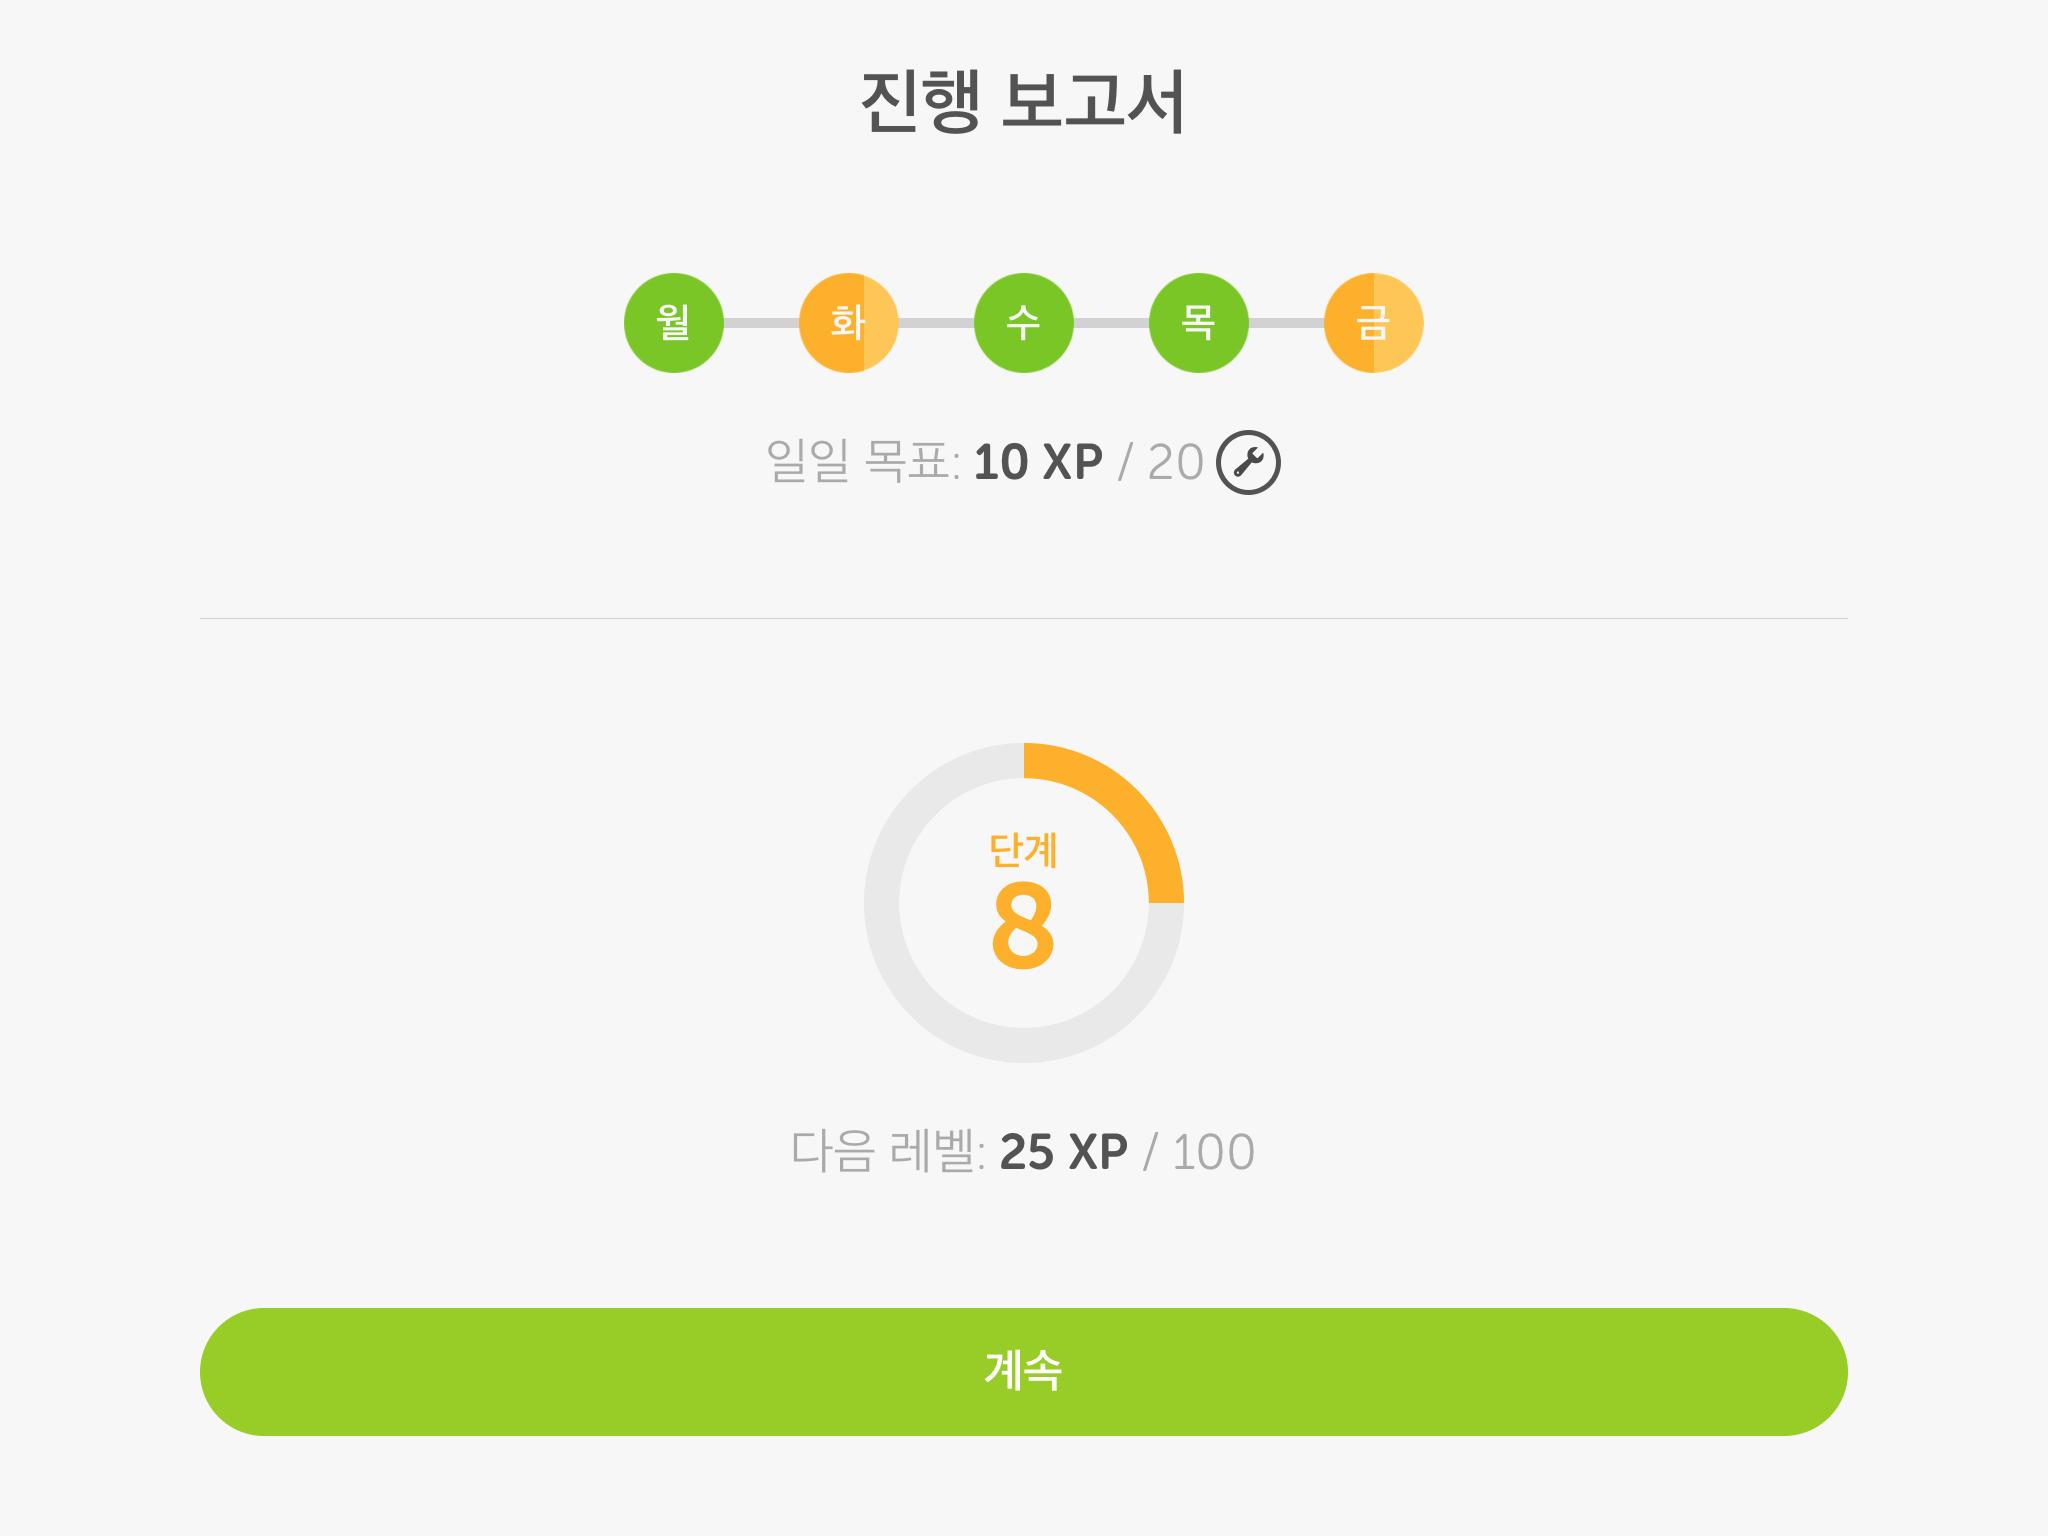 Duolingo-Korea